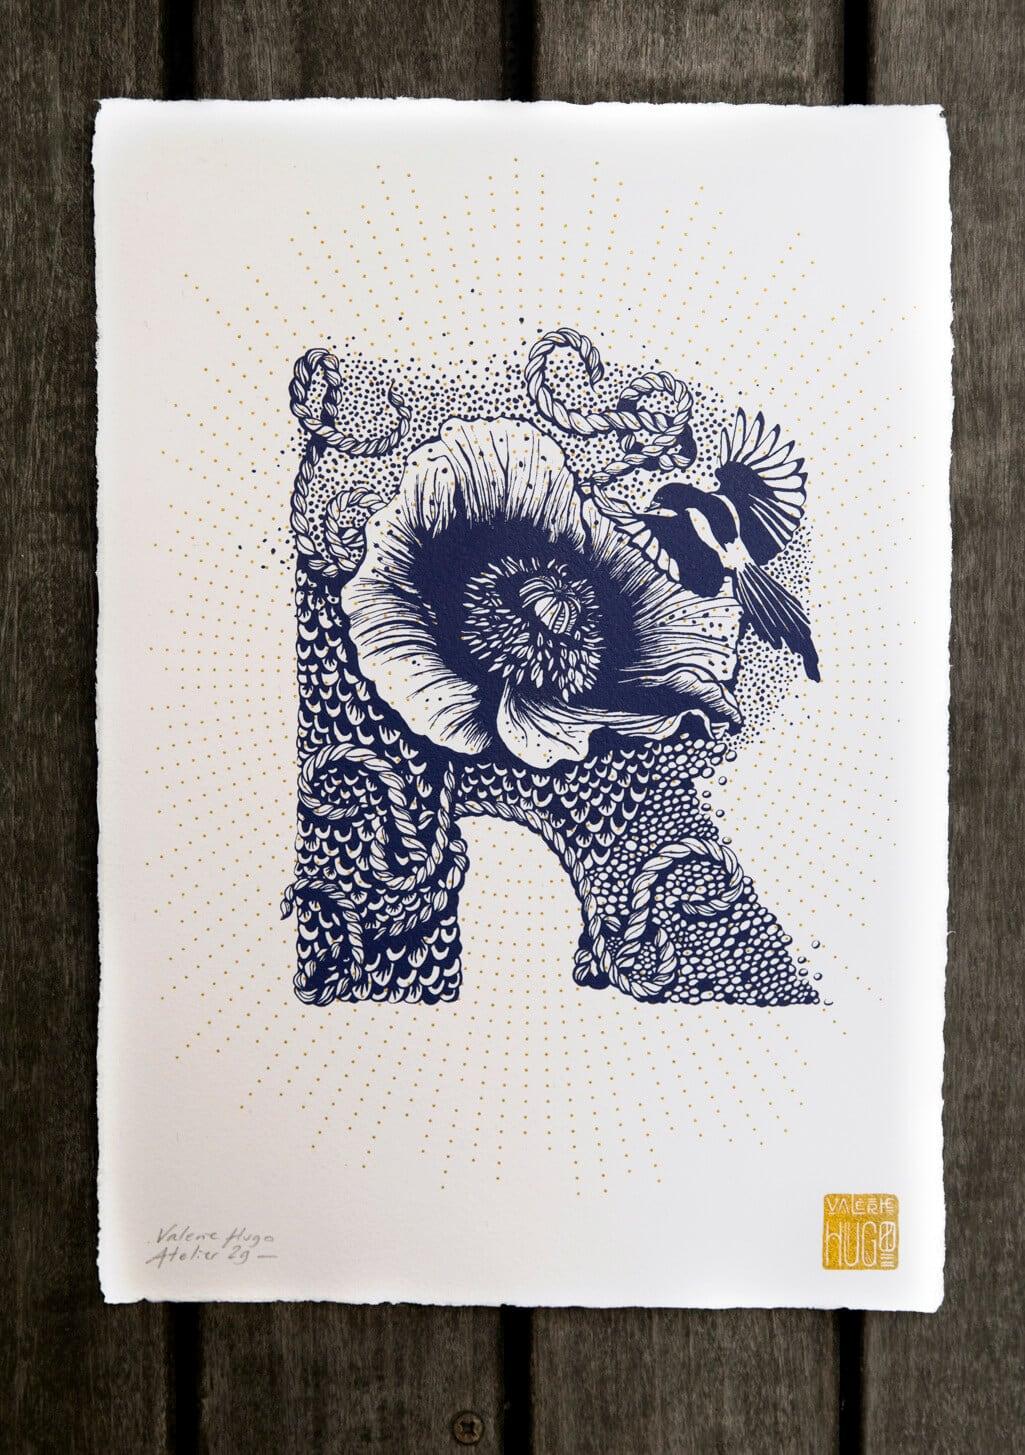 typography-valerie-hugo-fy-11